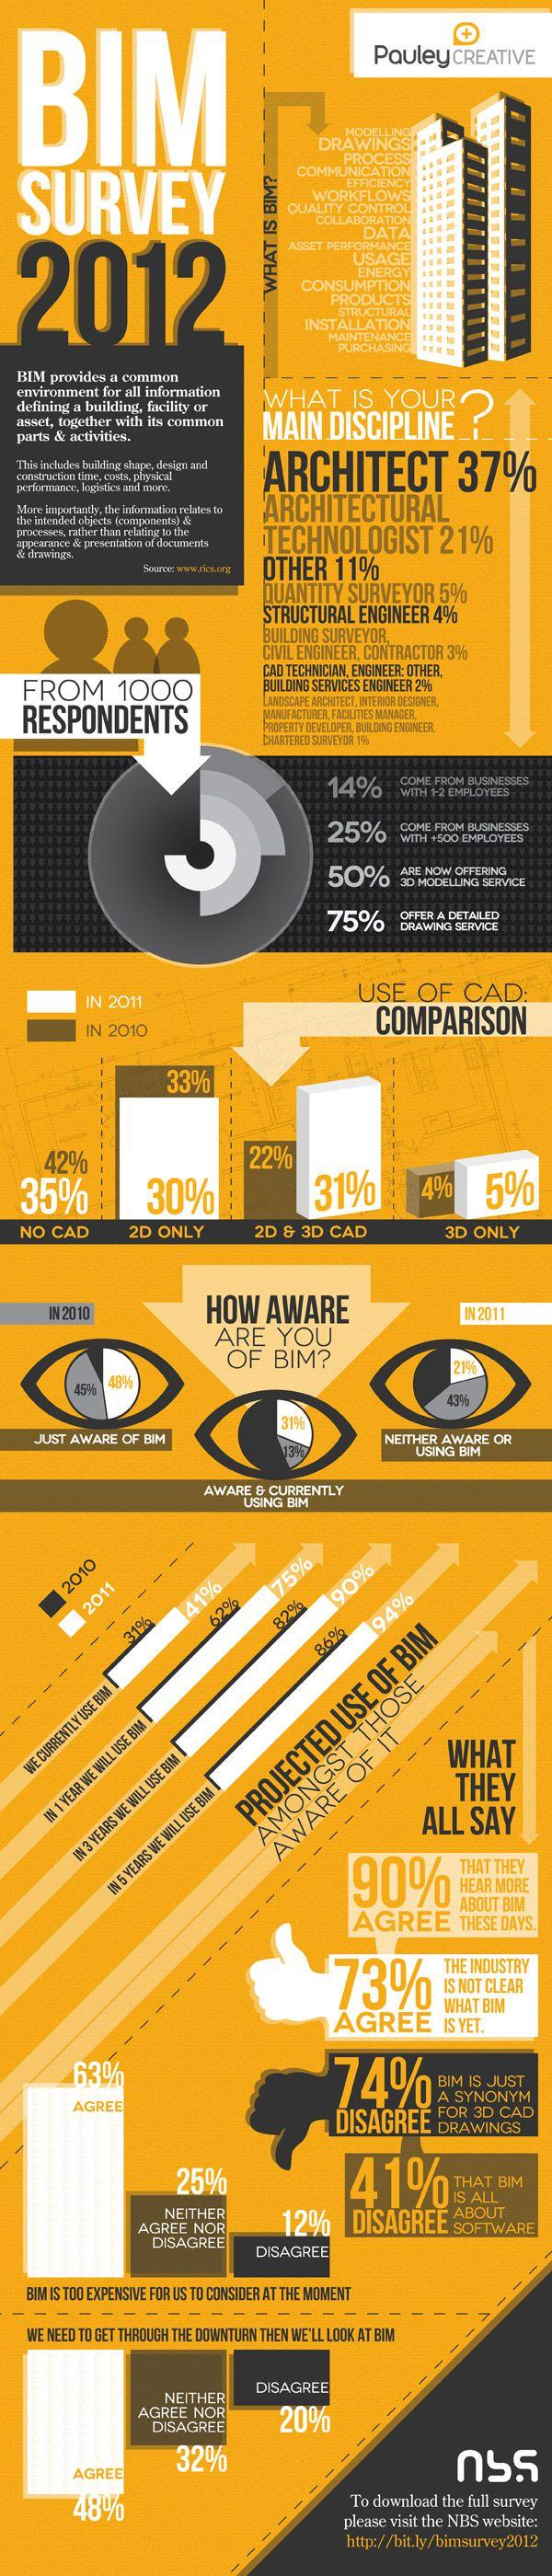 Super intreressant! BIM survey 2012